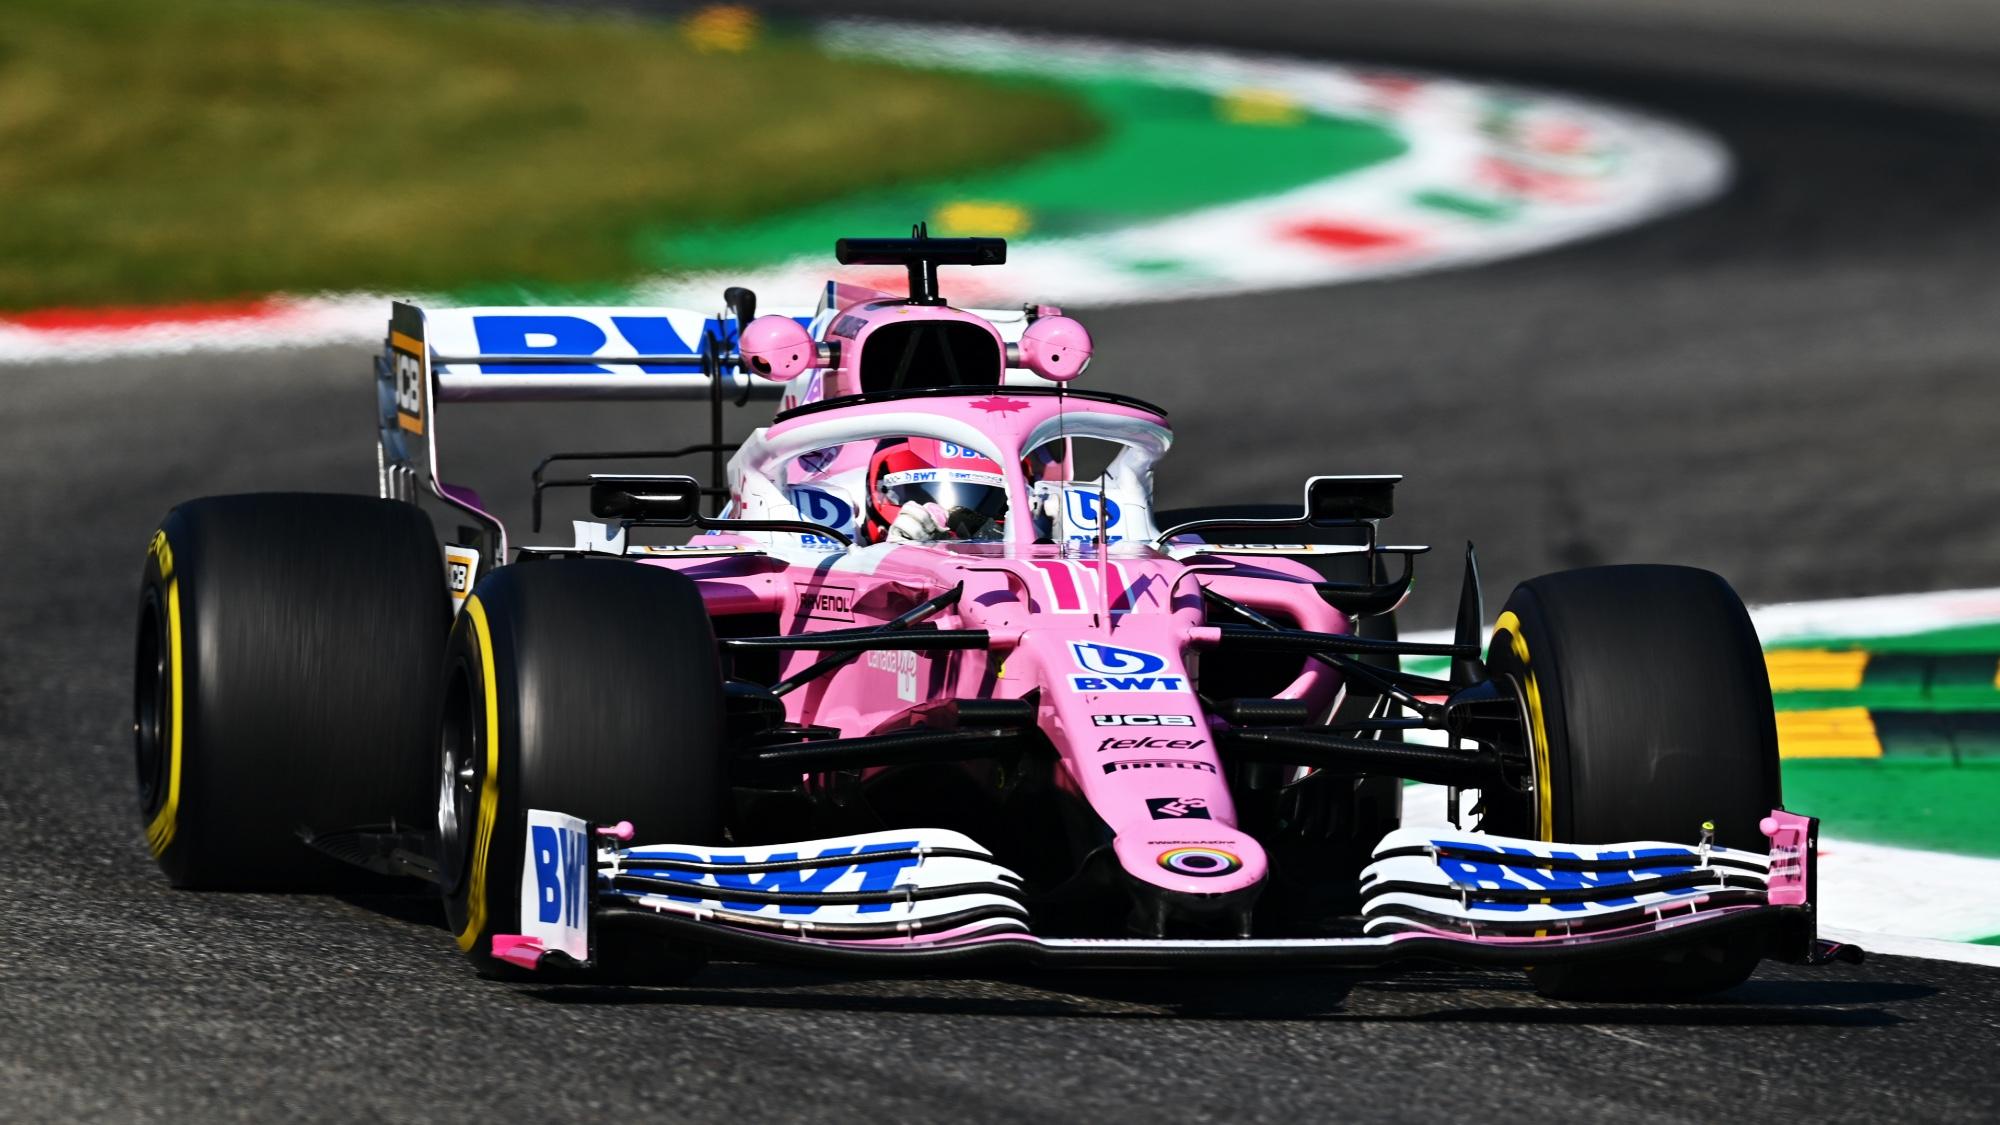 Sergio Perez, 2020 Italian GP